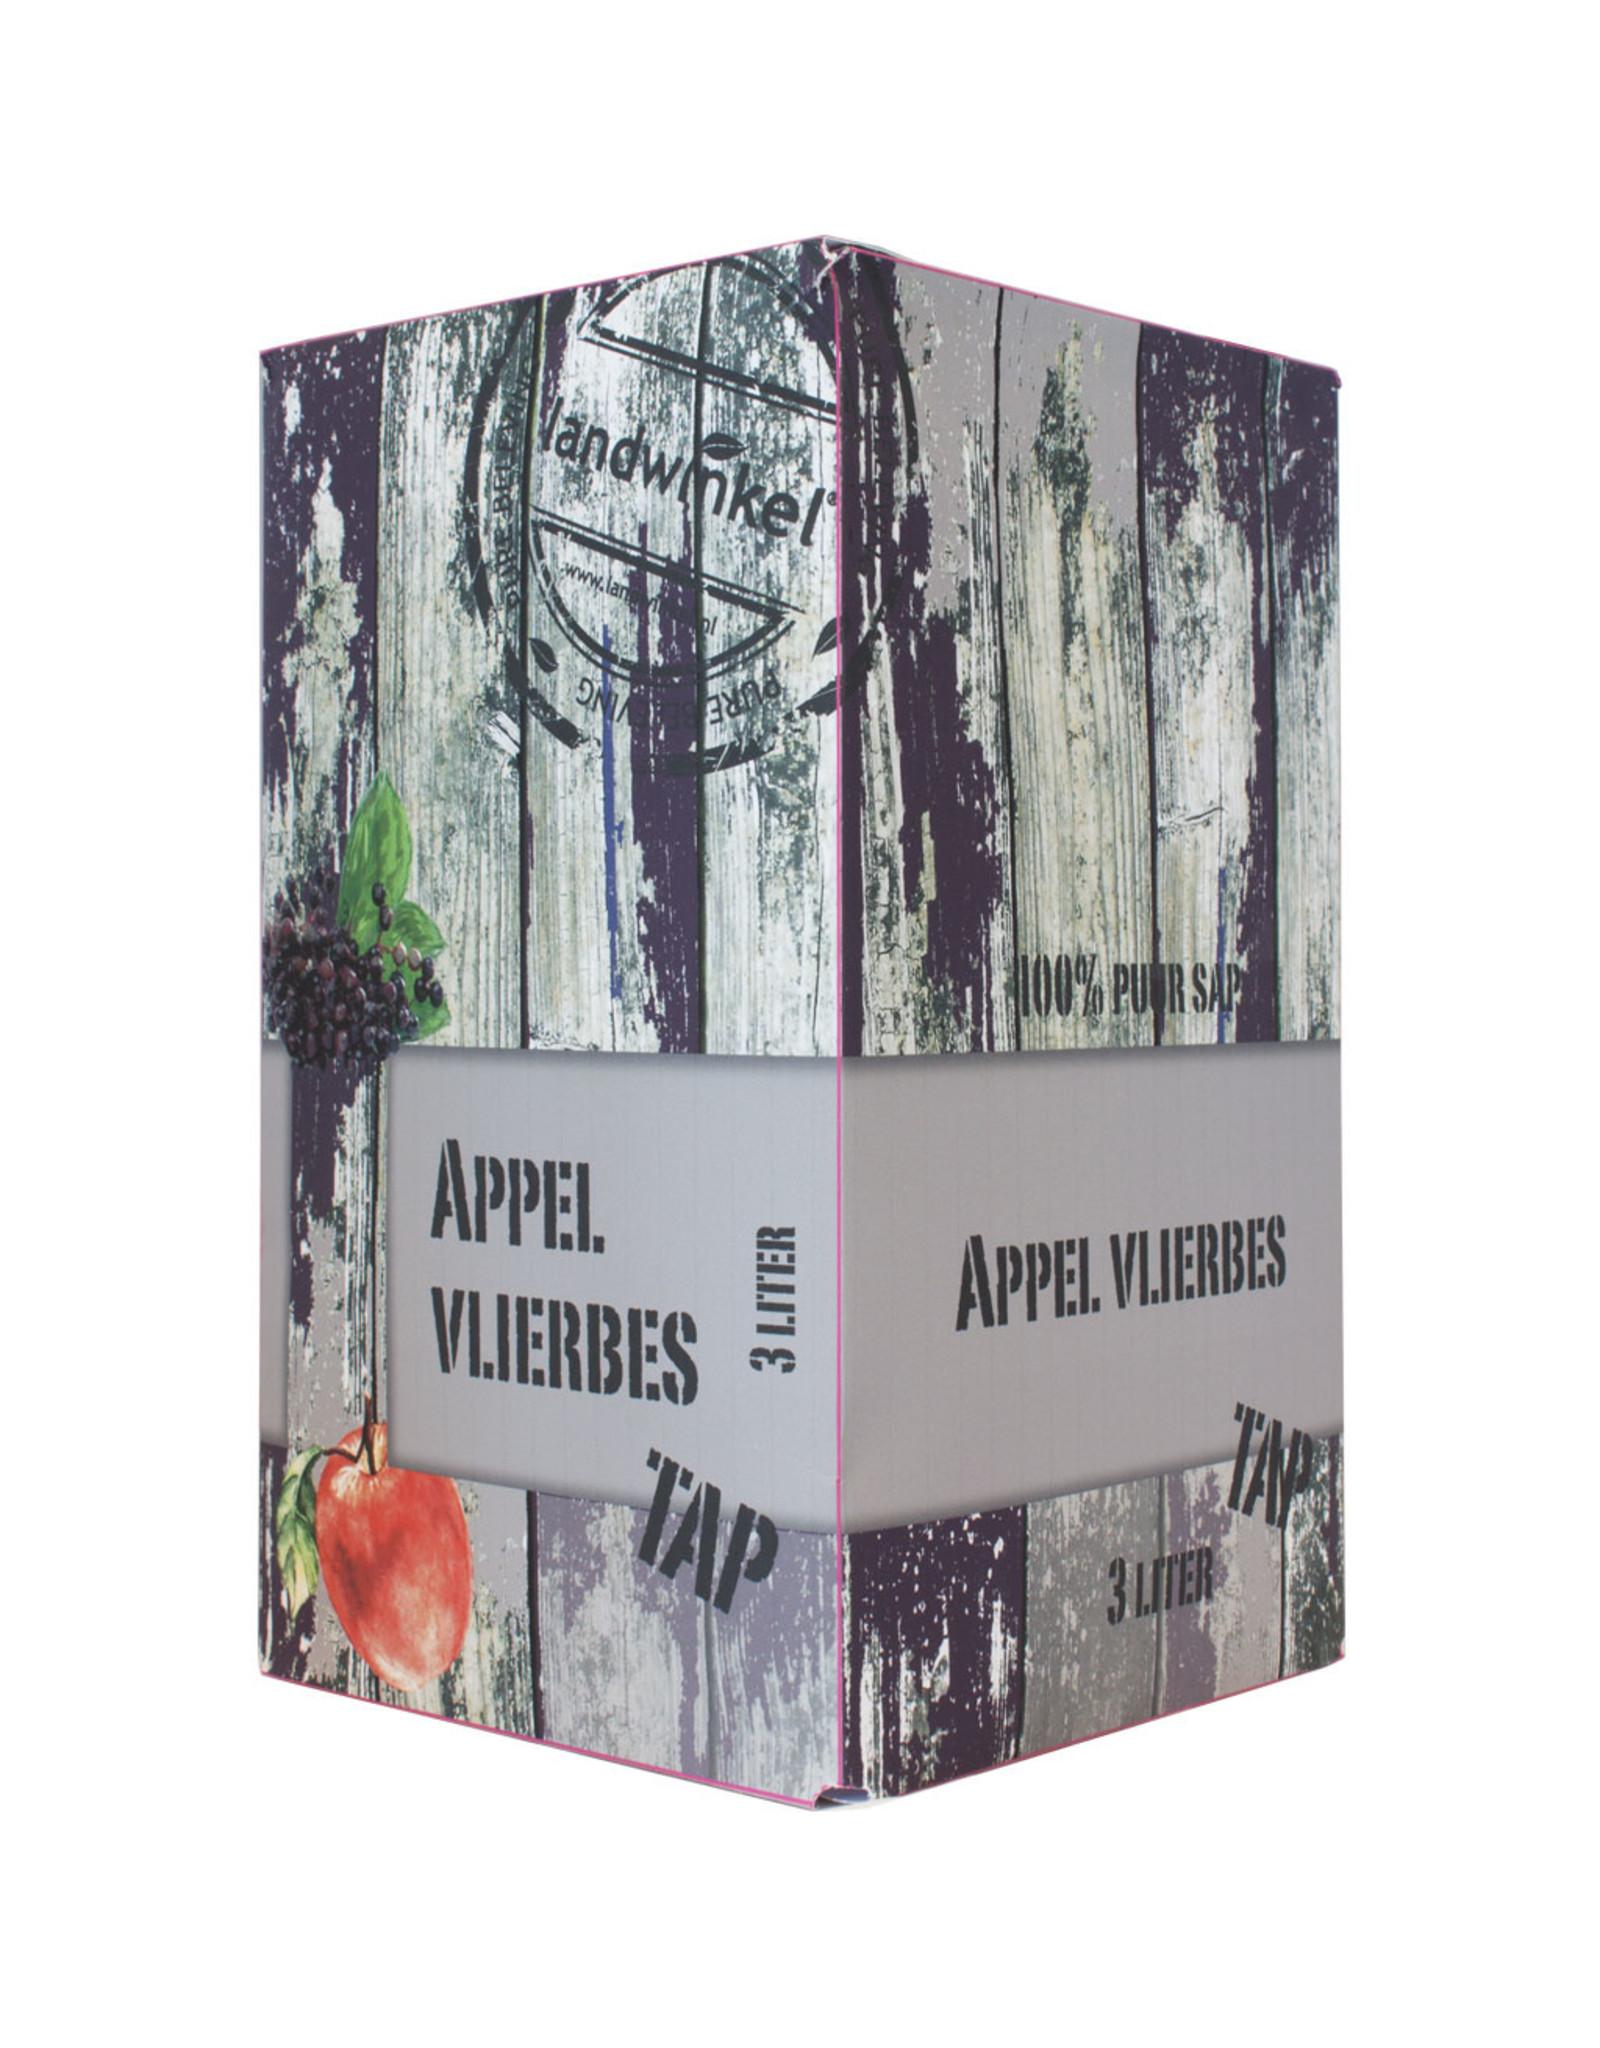 Landwinkel Appeltap sap appel Vlierbes 3 ltr